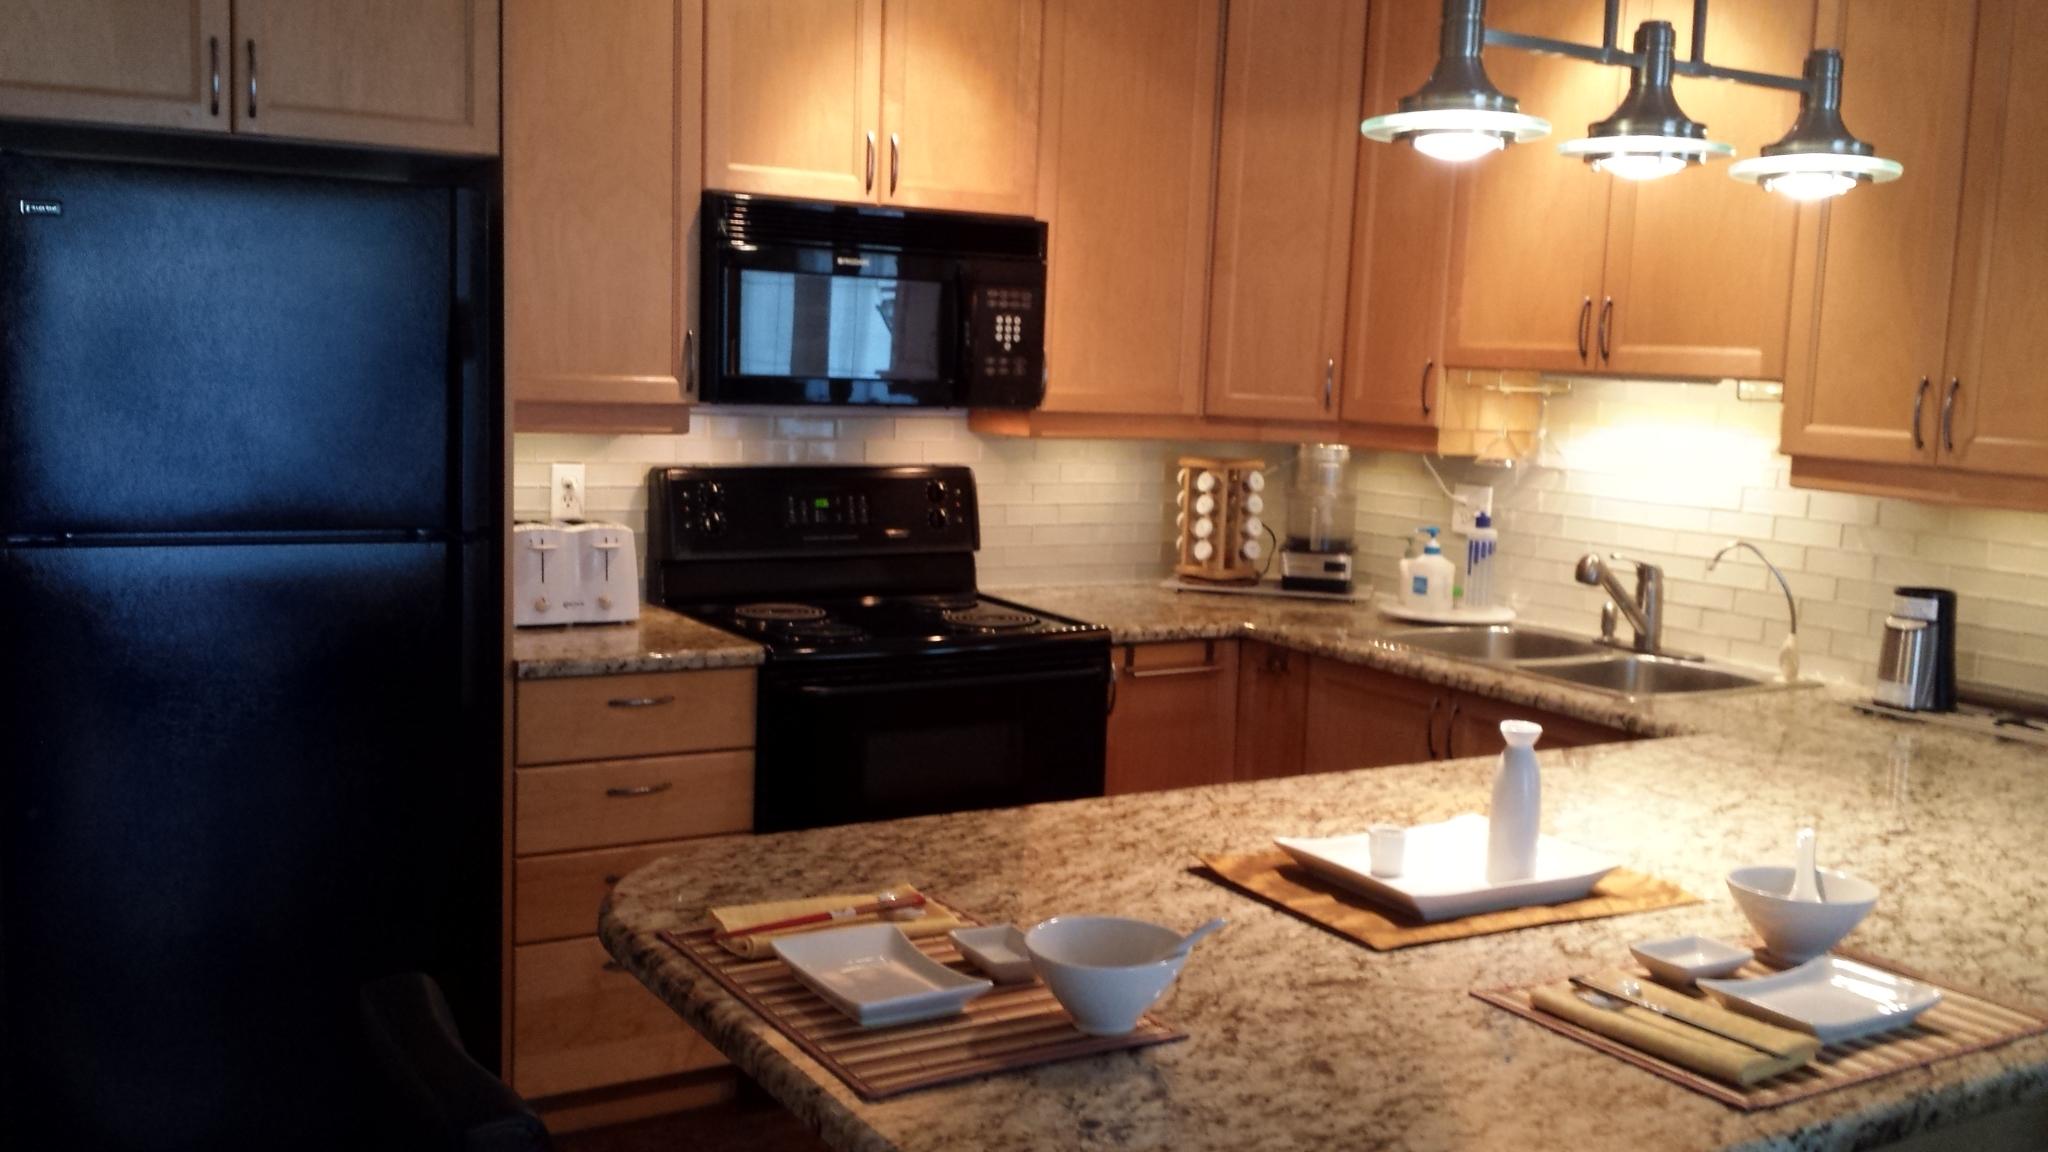 Unit 204 Kitchen 3